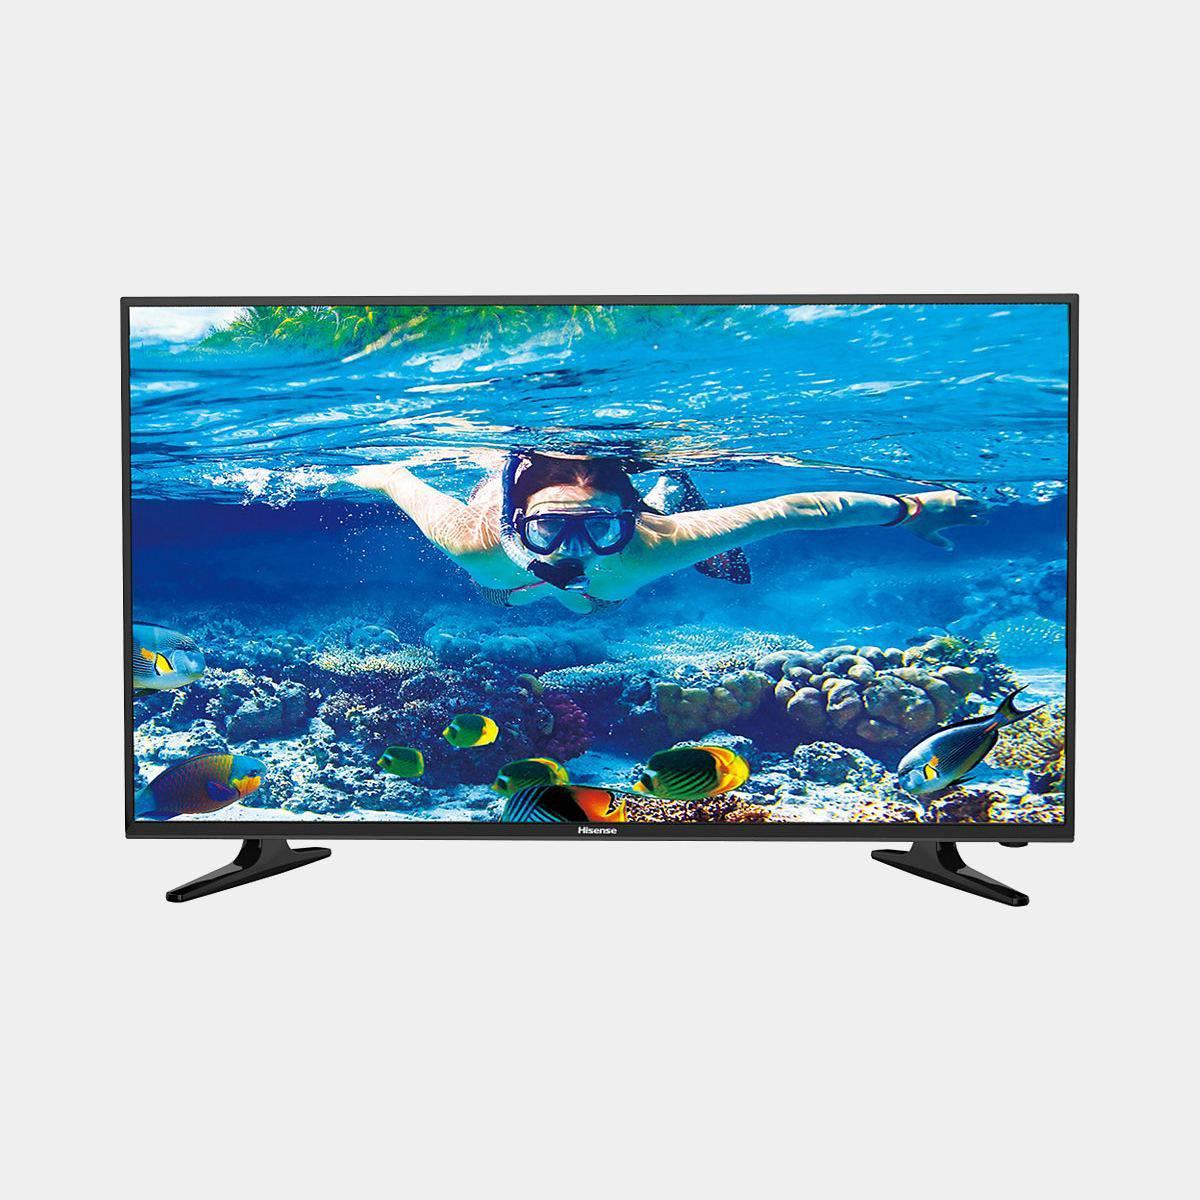 Televisor Hisense 40D50ts Full HD Usb